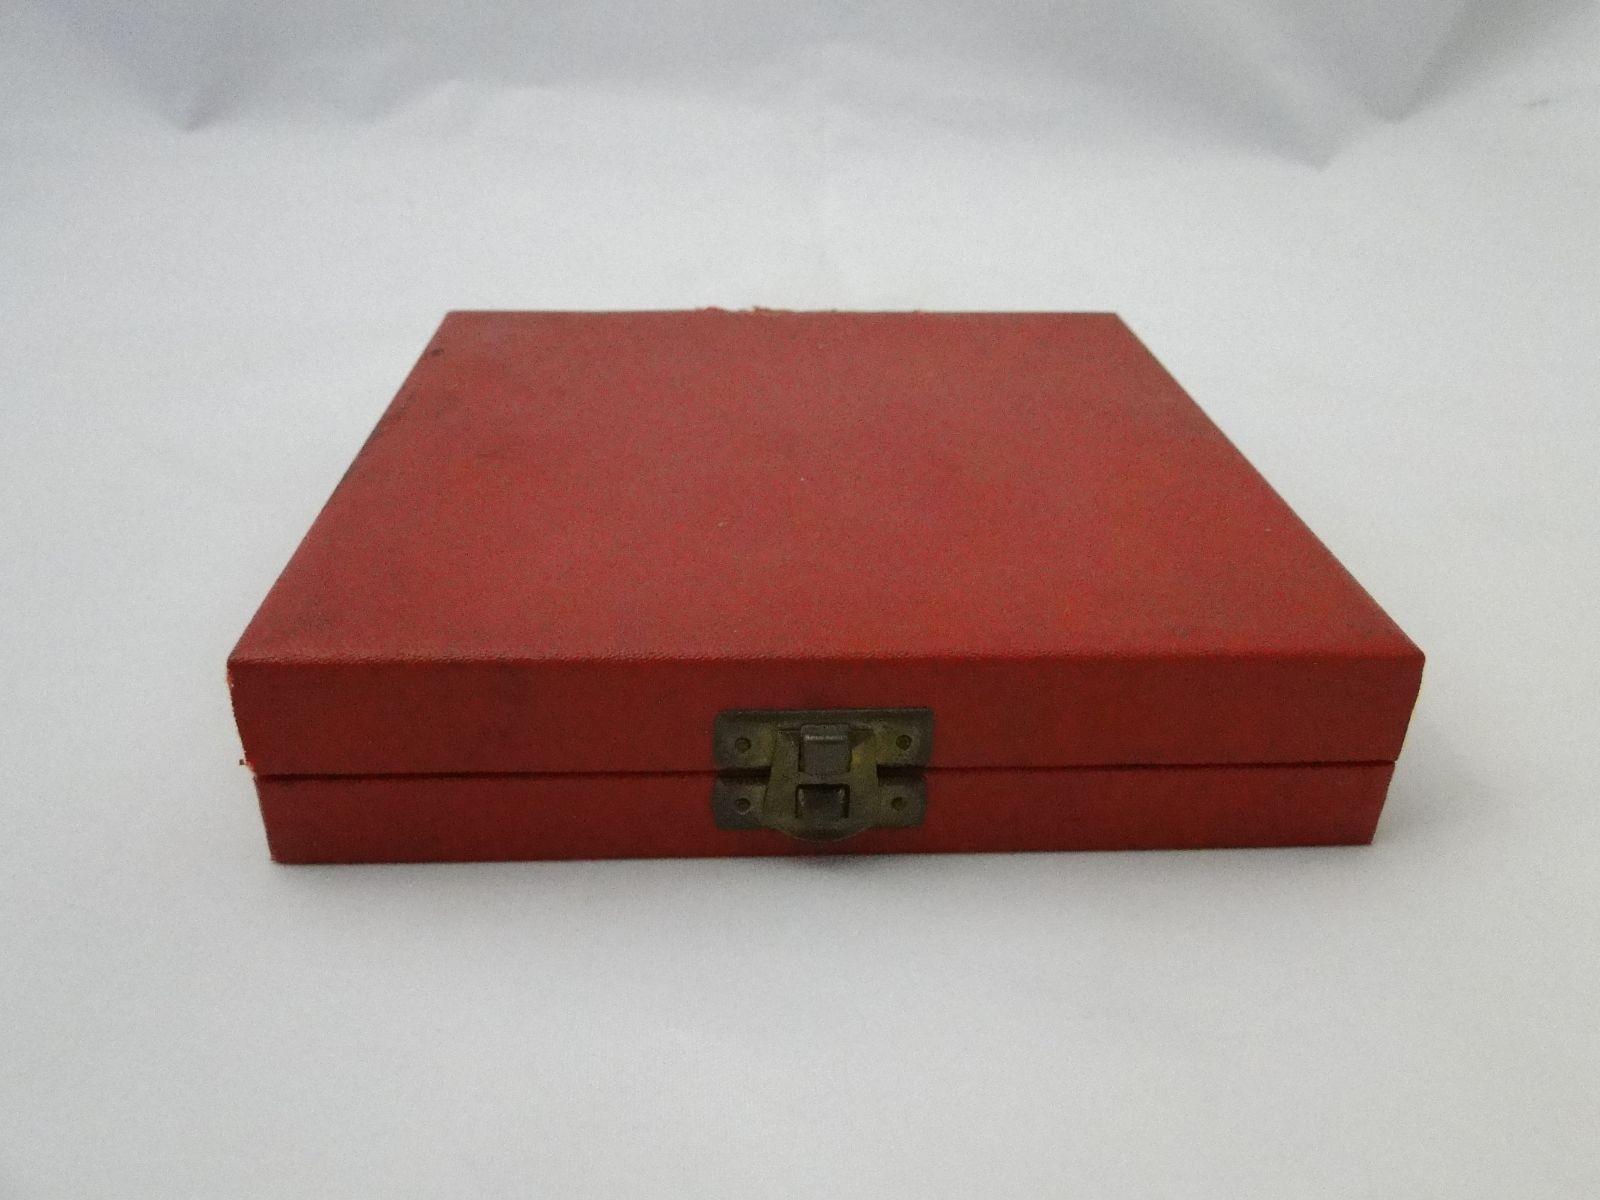 DSC08031.JPG (1600�1200)